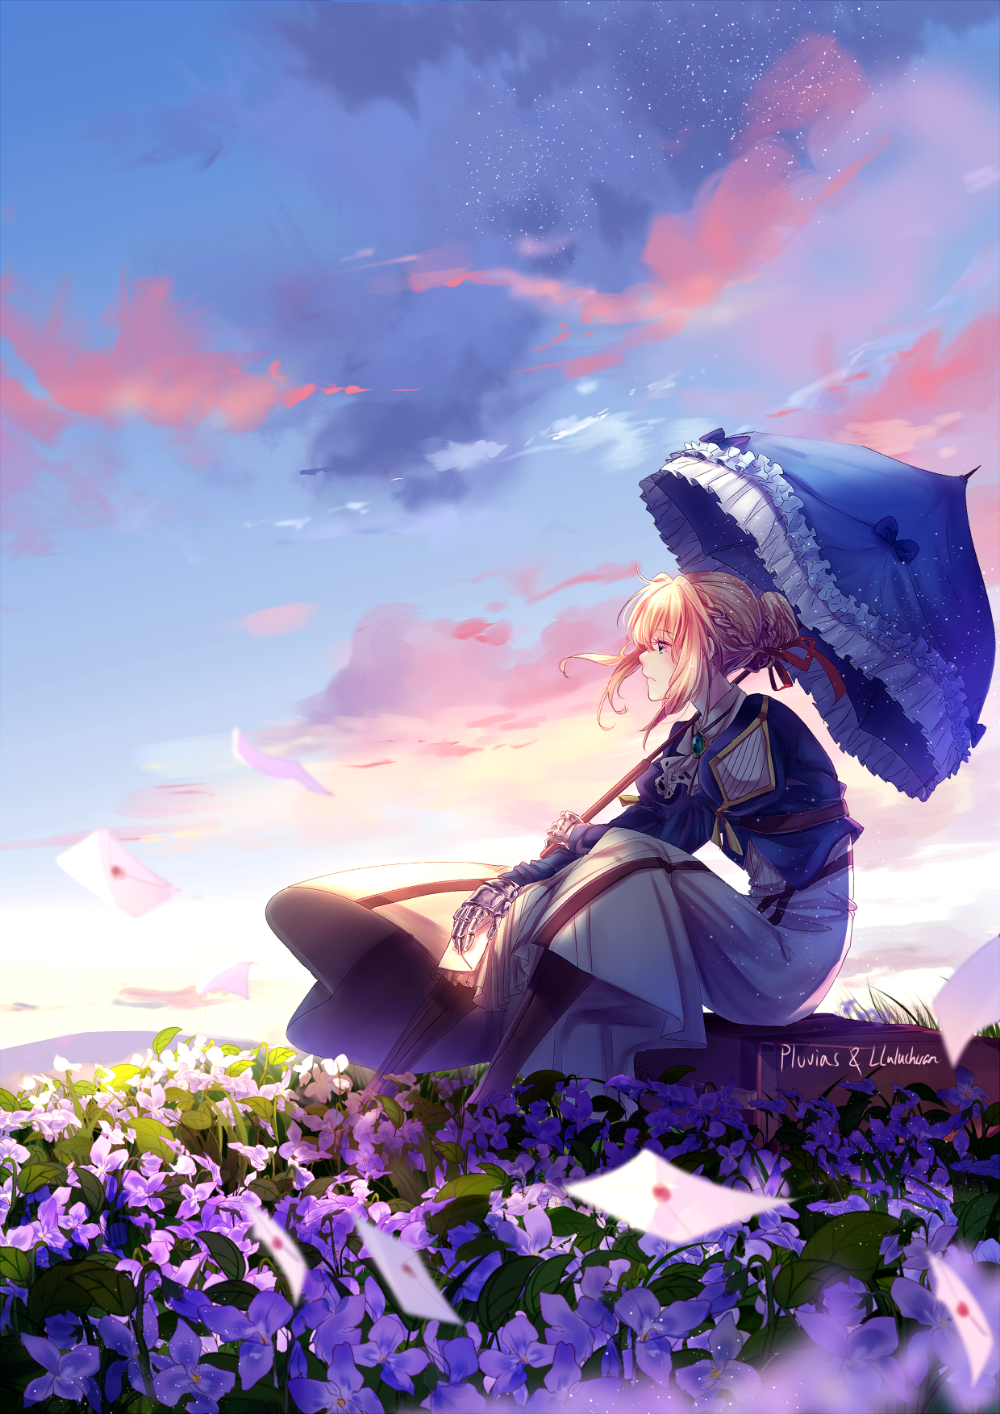 Pin by Azumi Kimiyama on ♠Anime♠ Violet evergarden anime